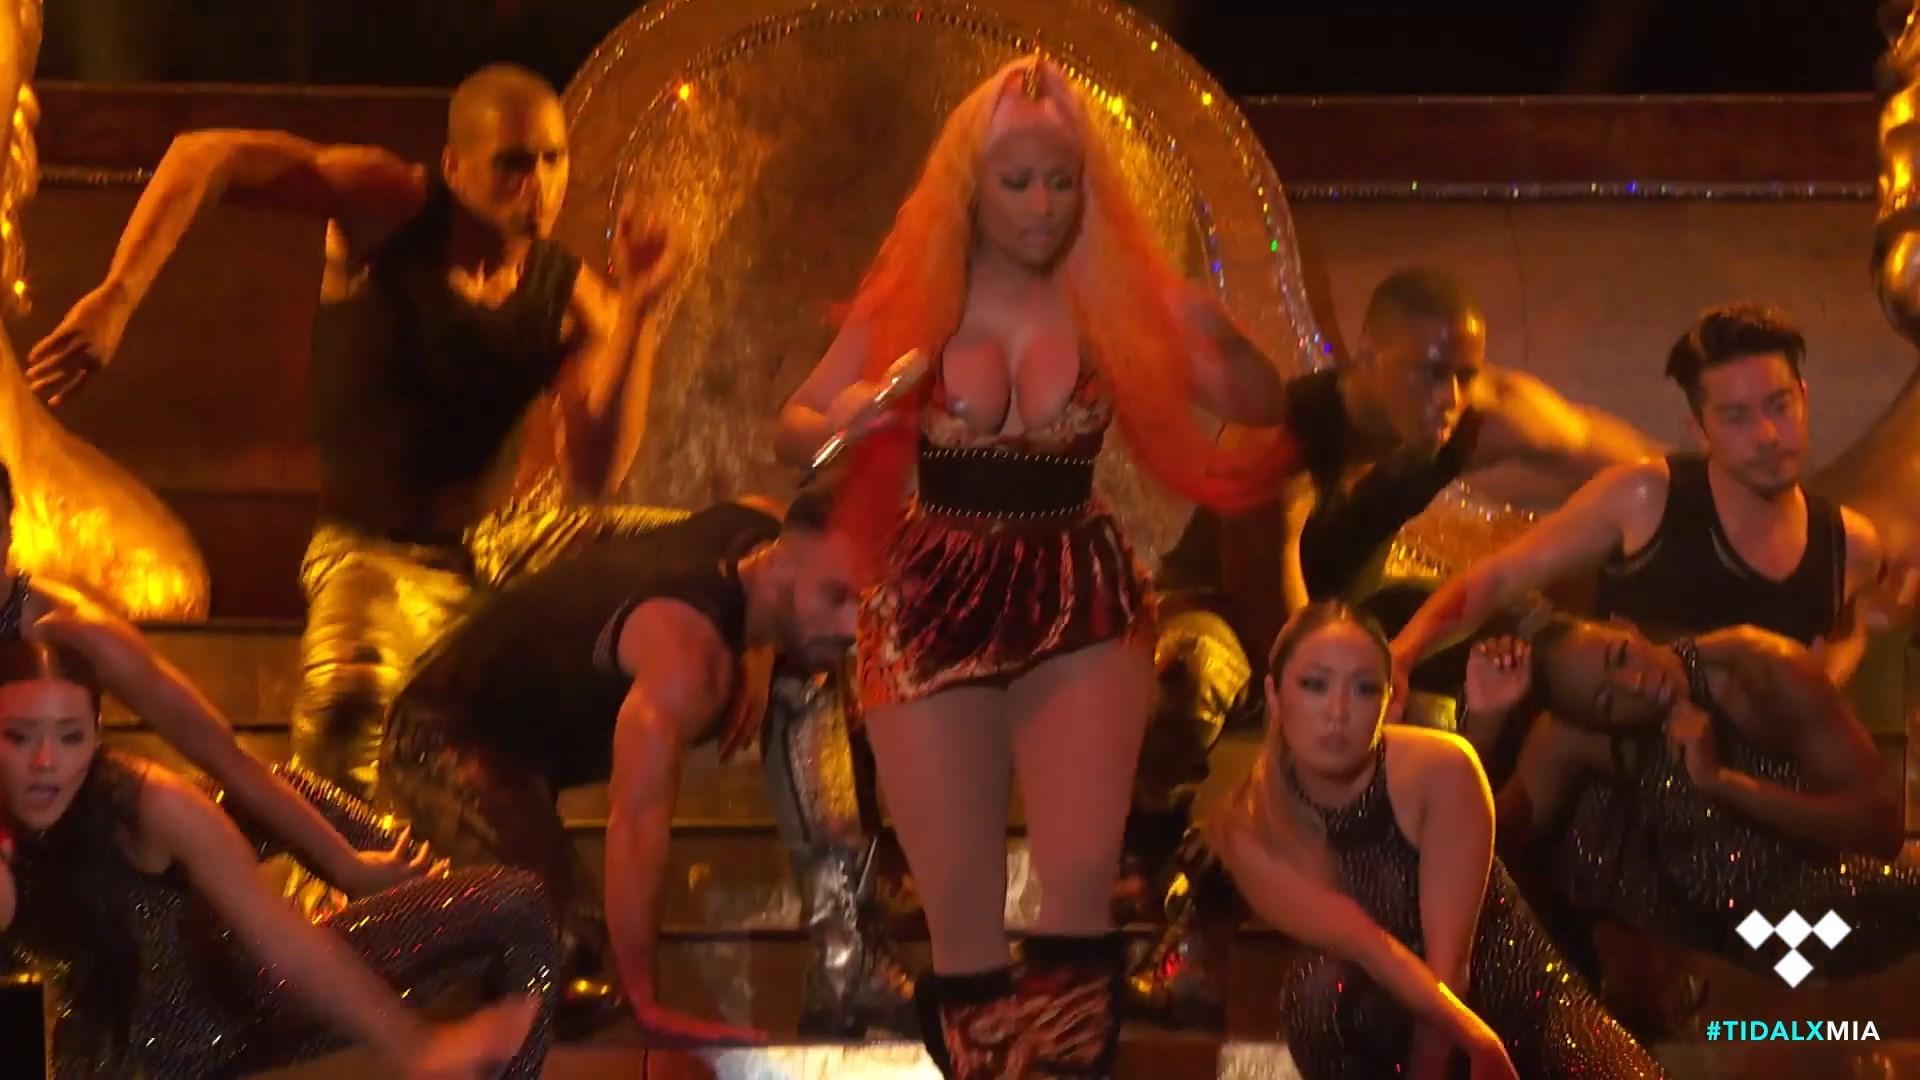 Nicki-Minaj-Nude-TheFappeningBlog.com-9.jpg